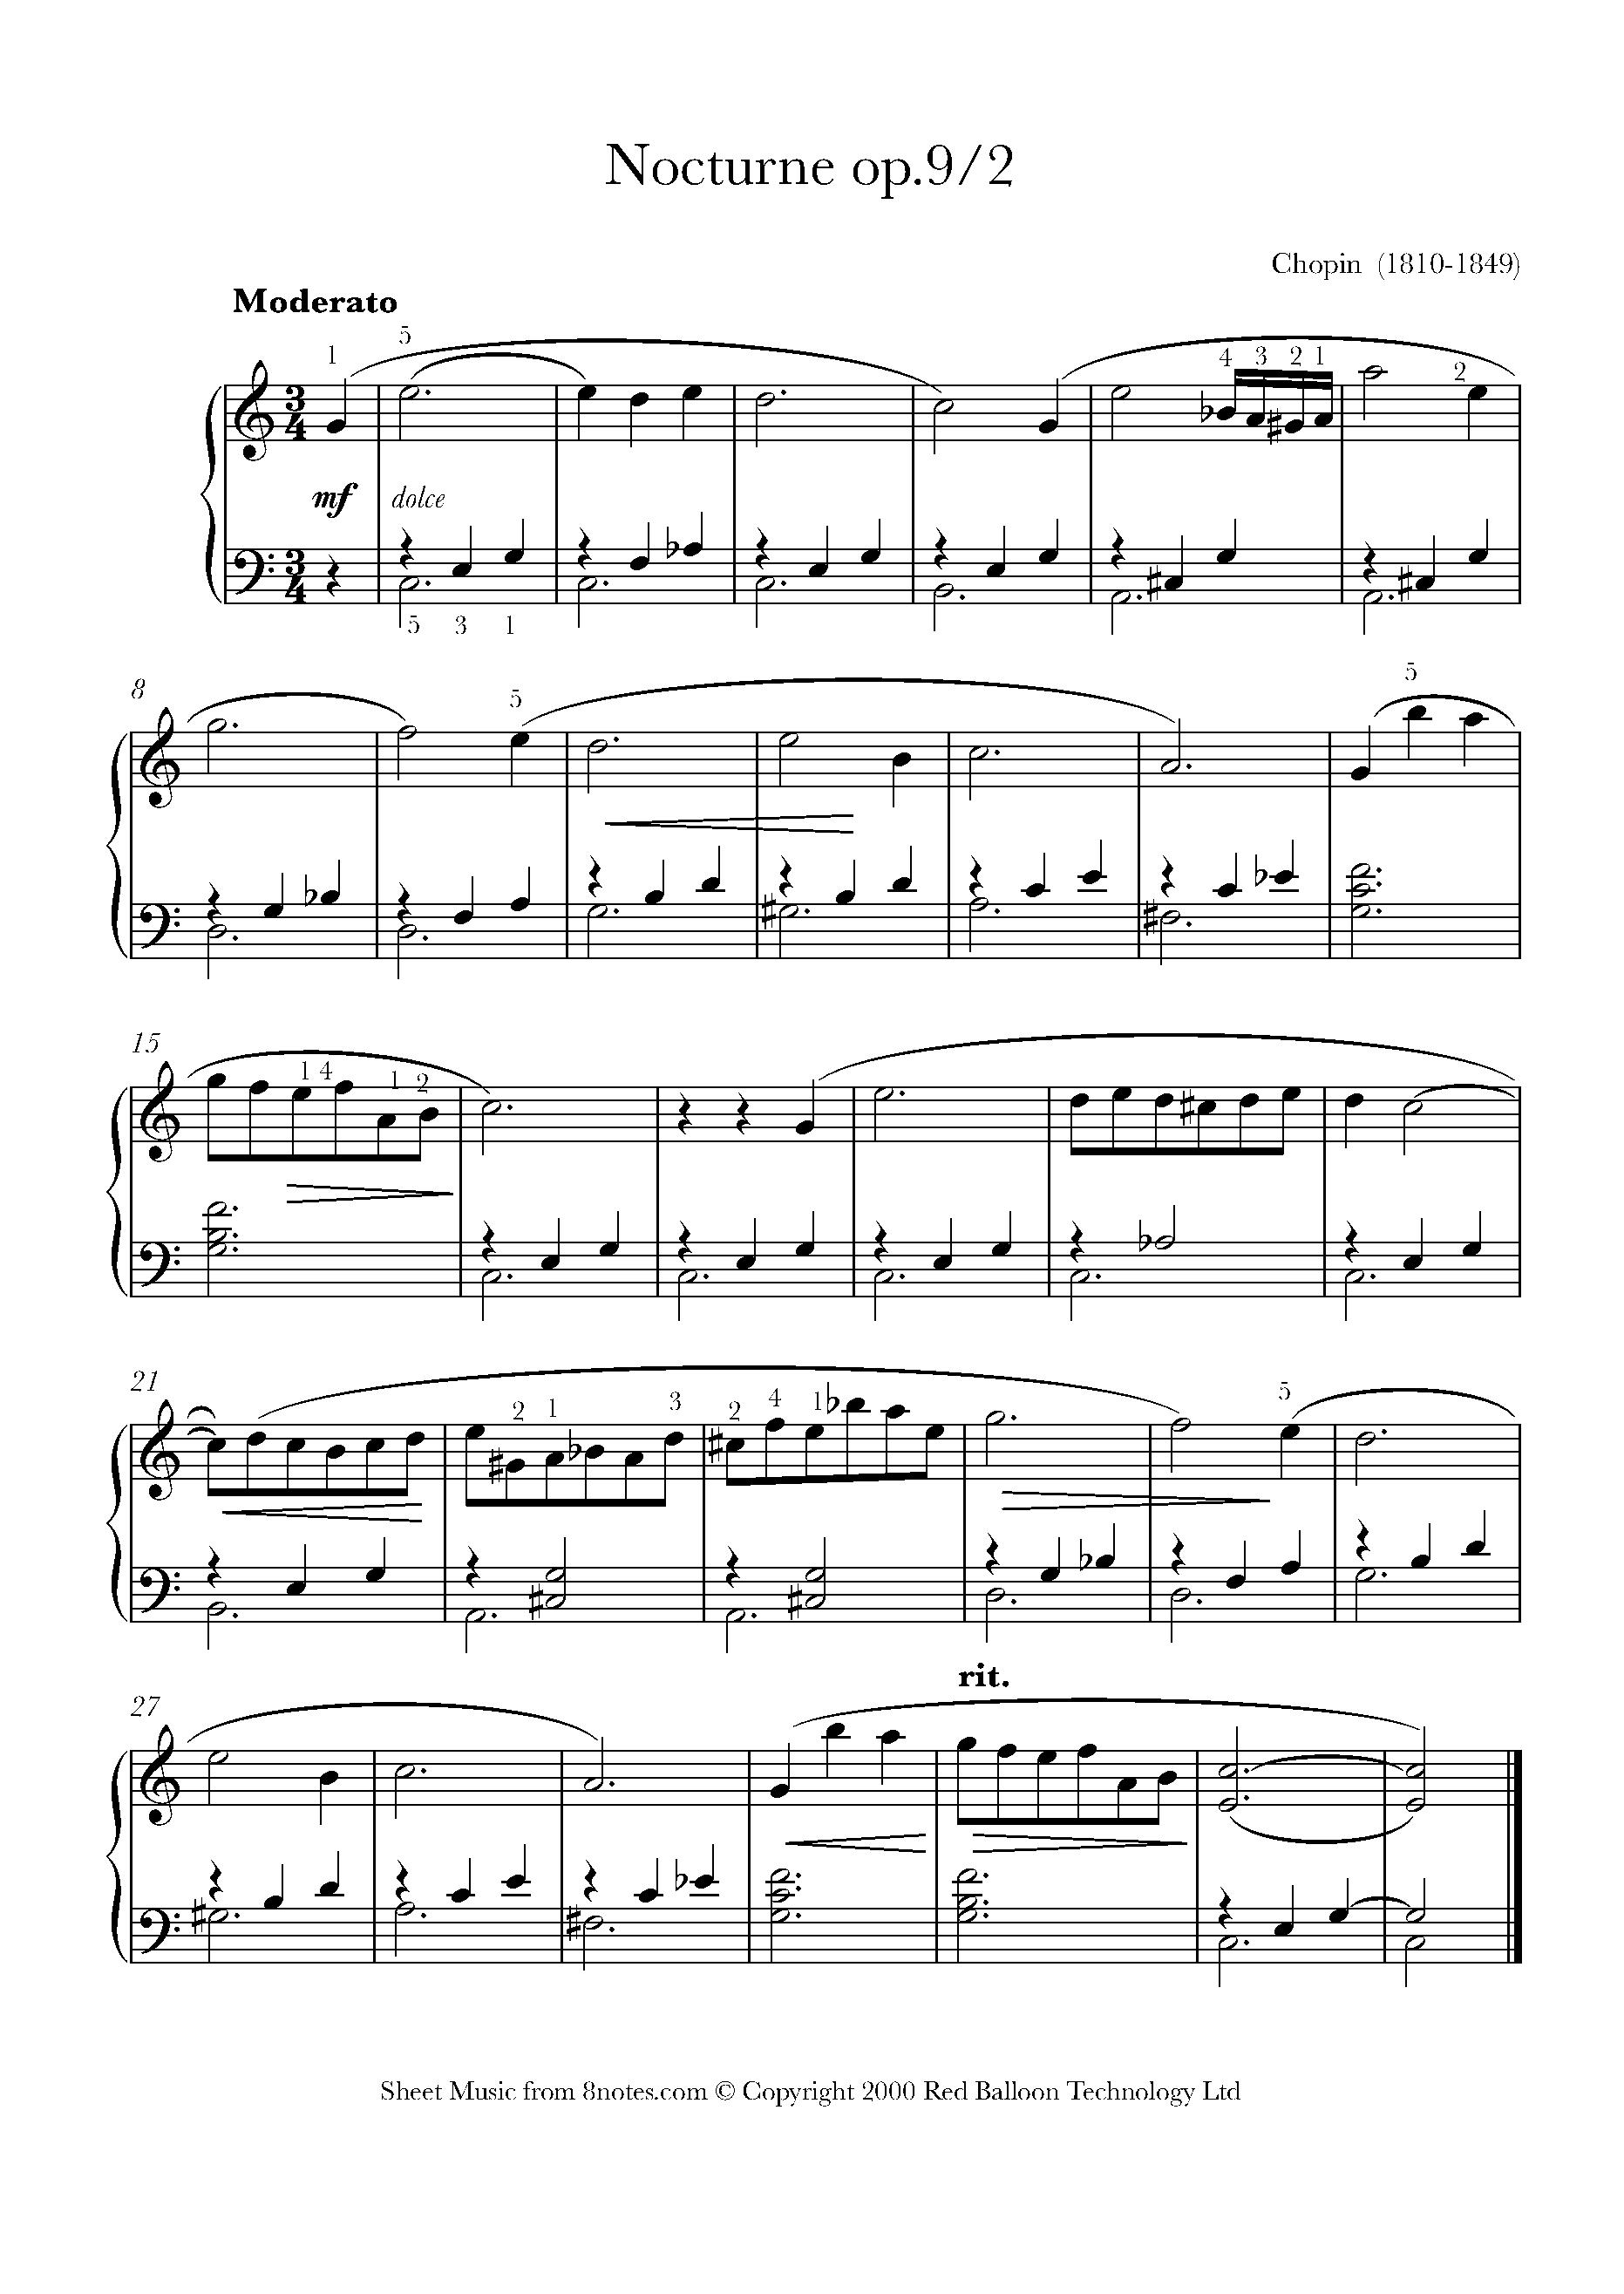 5 Popular Easy Arrangements of Chopin Piano Pieces - 8notes com